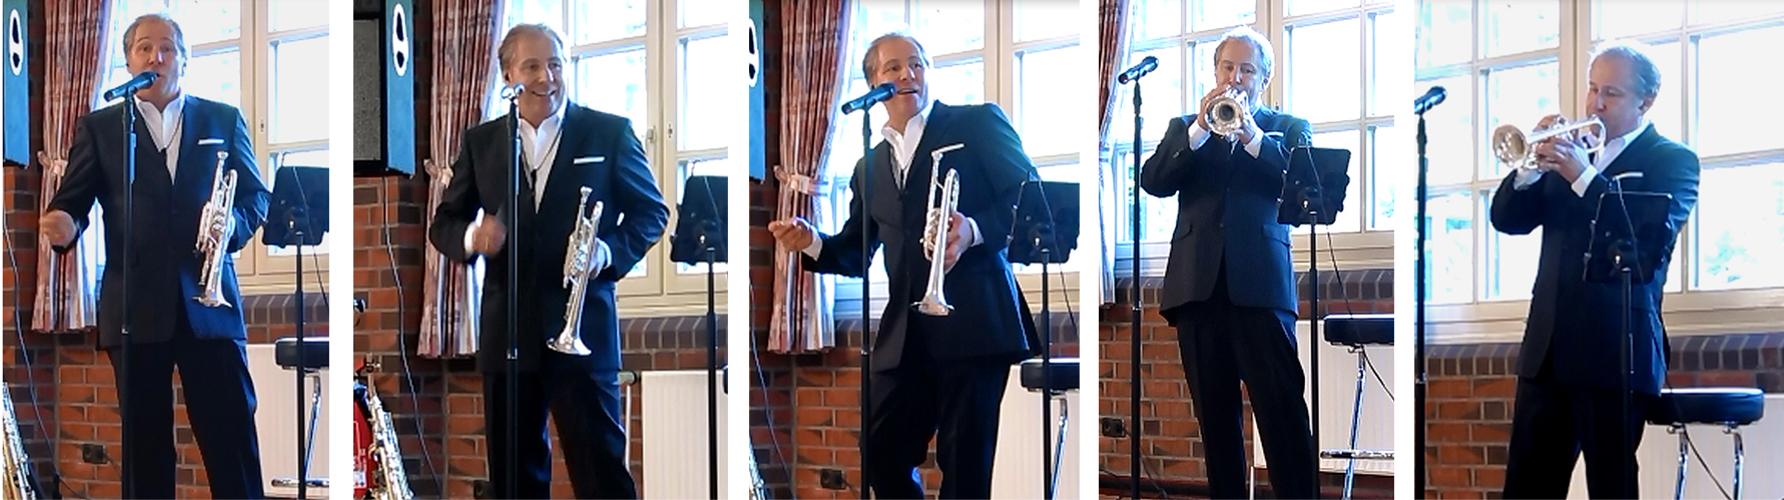 Sampler Trompete Anzug kurz